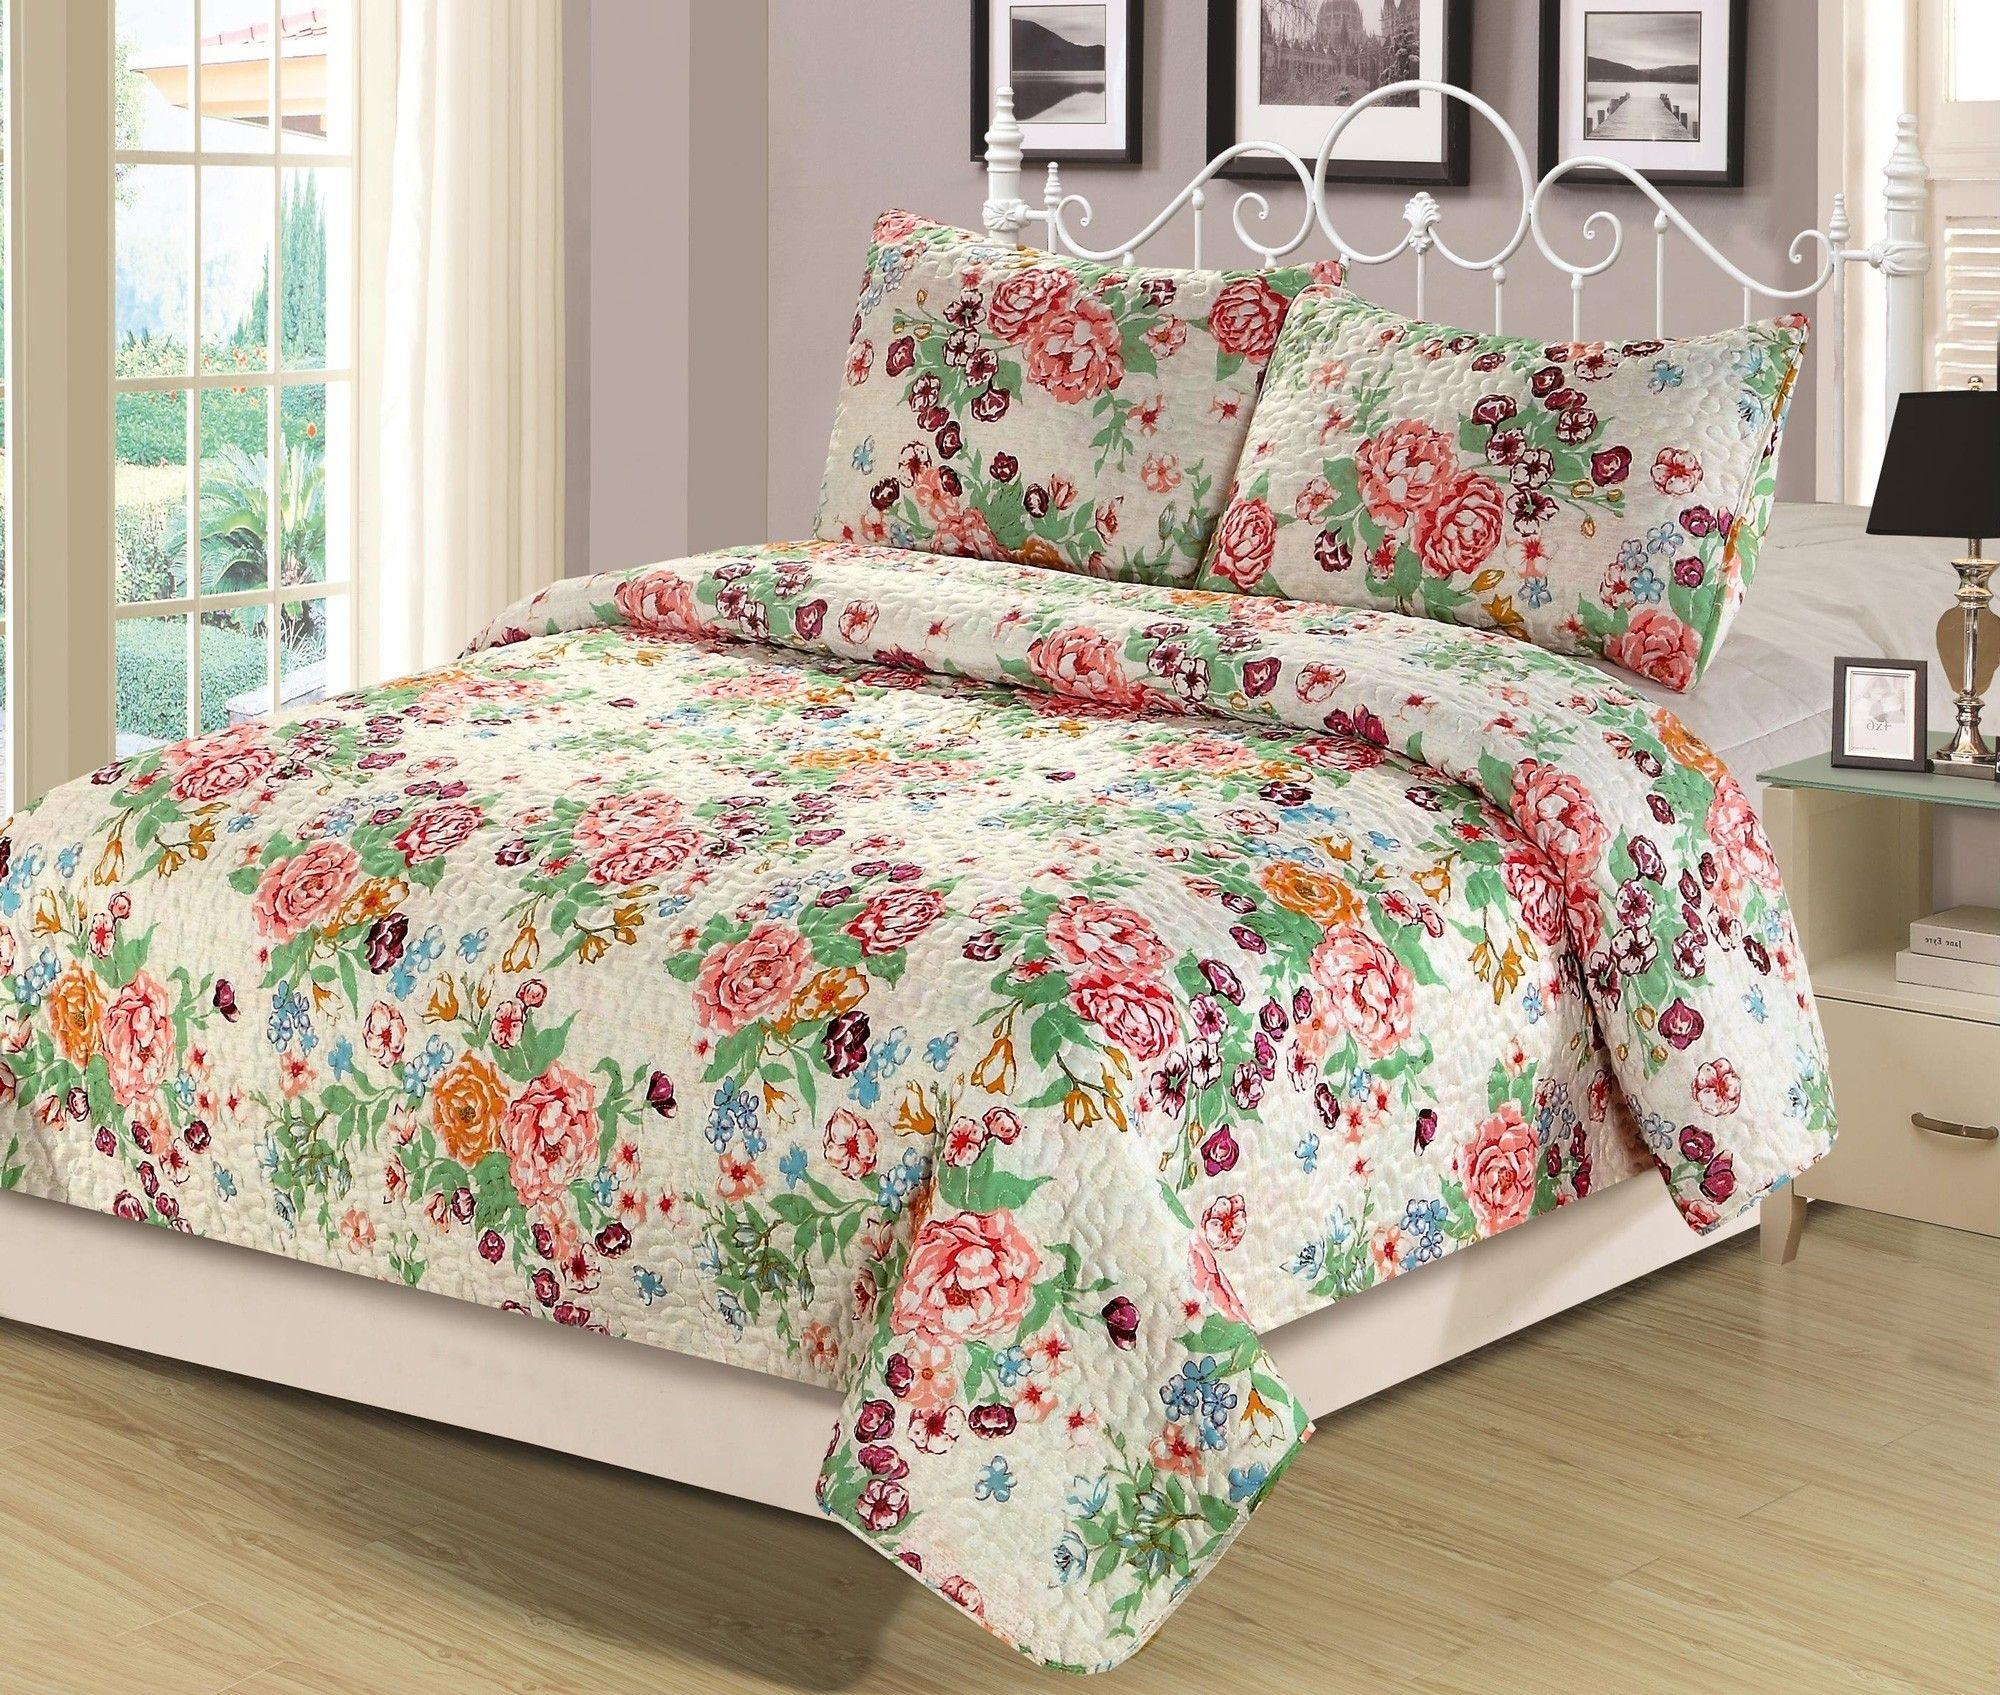 Beatrice Floral Bouquet Full Queen Quilt Pink Blue Orange Flowers